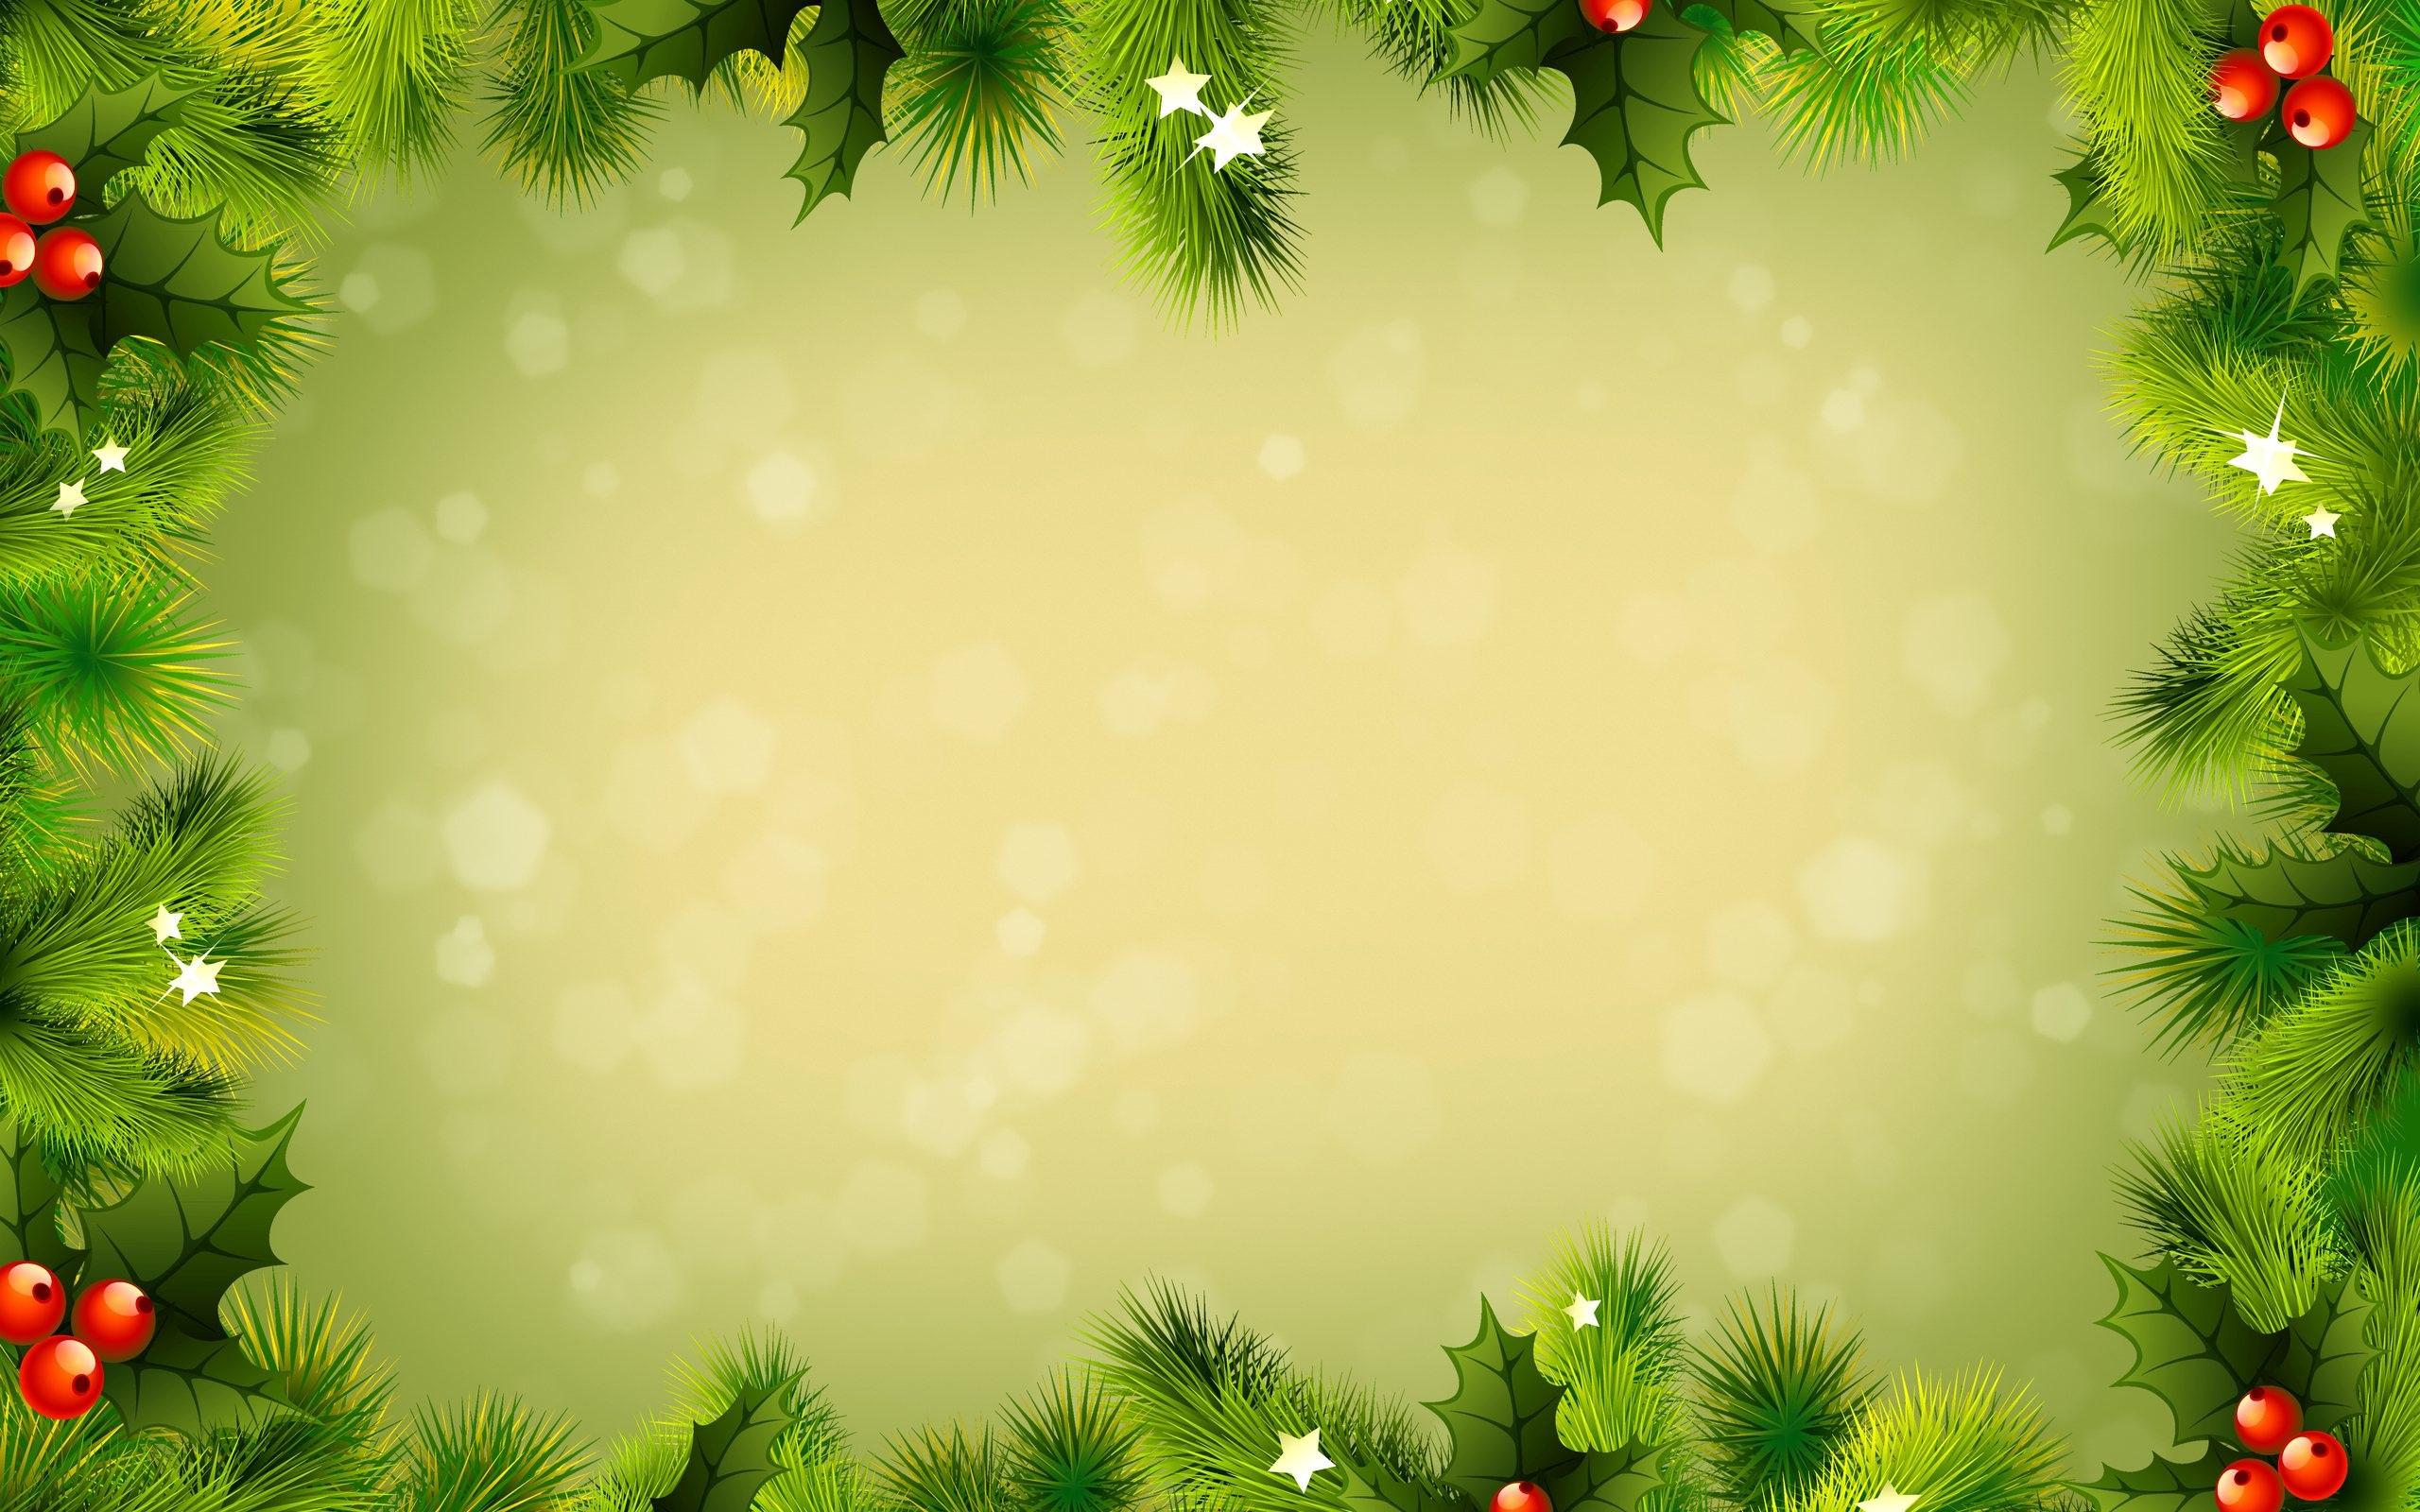 Green Christmas Decorations Hd Wallpaper Wallpaper List 2560x1600